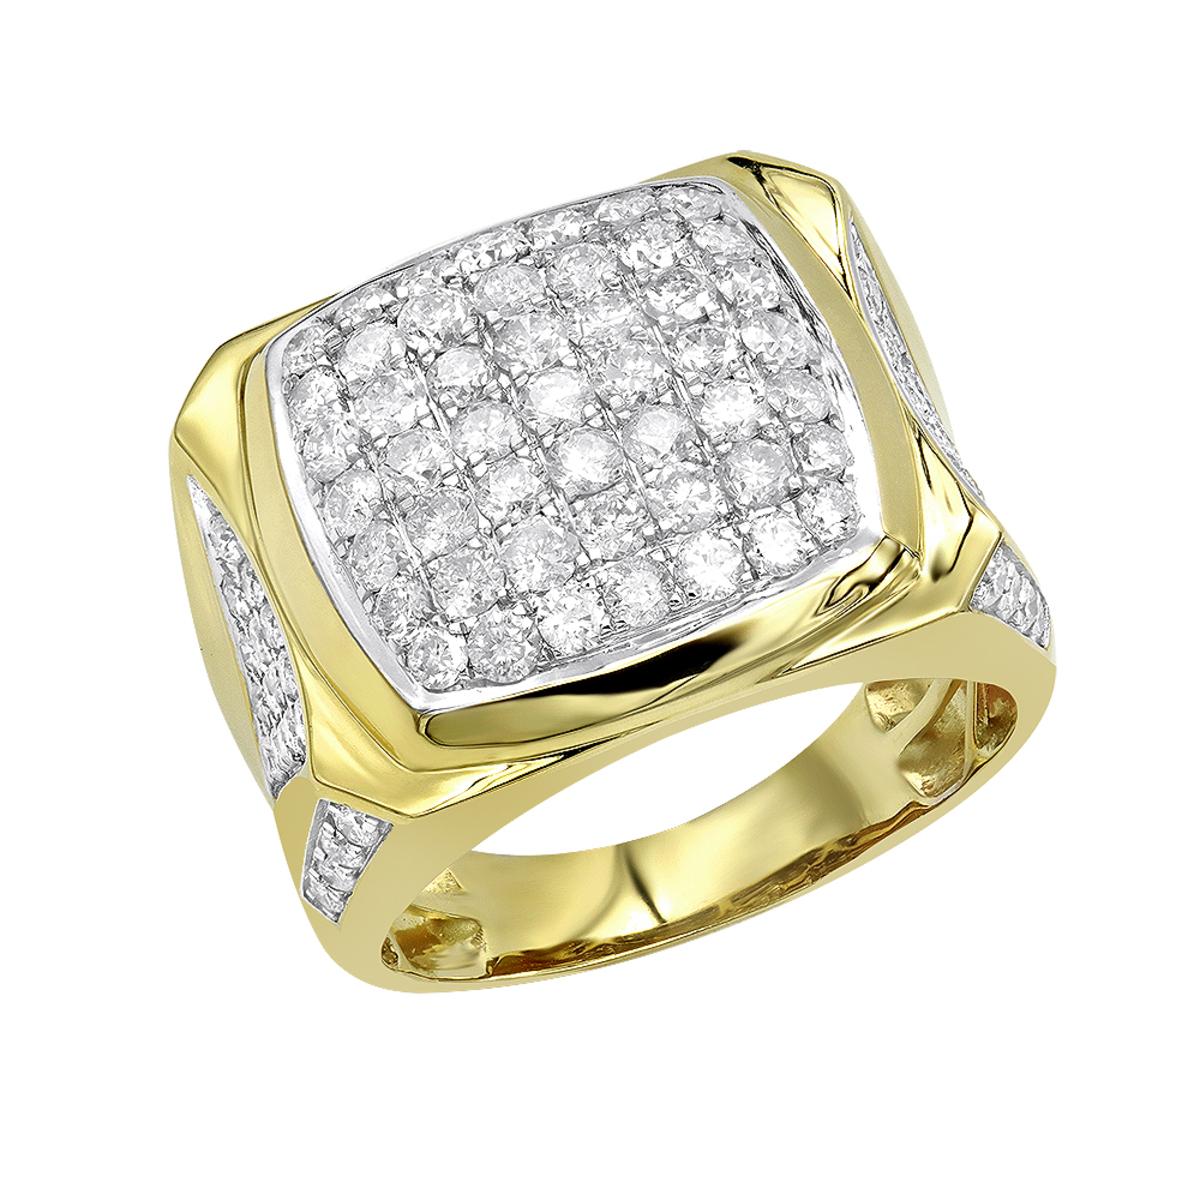 LUXURMAN Statement Jewelry: 10k Gold Mens Diamond Ring 3 Carat Pinky Ring